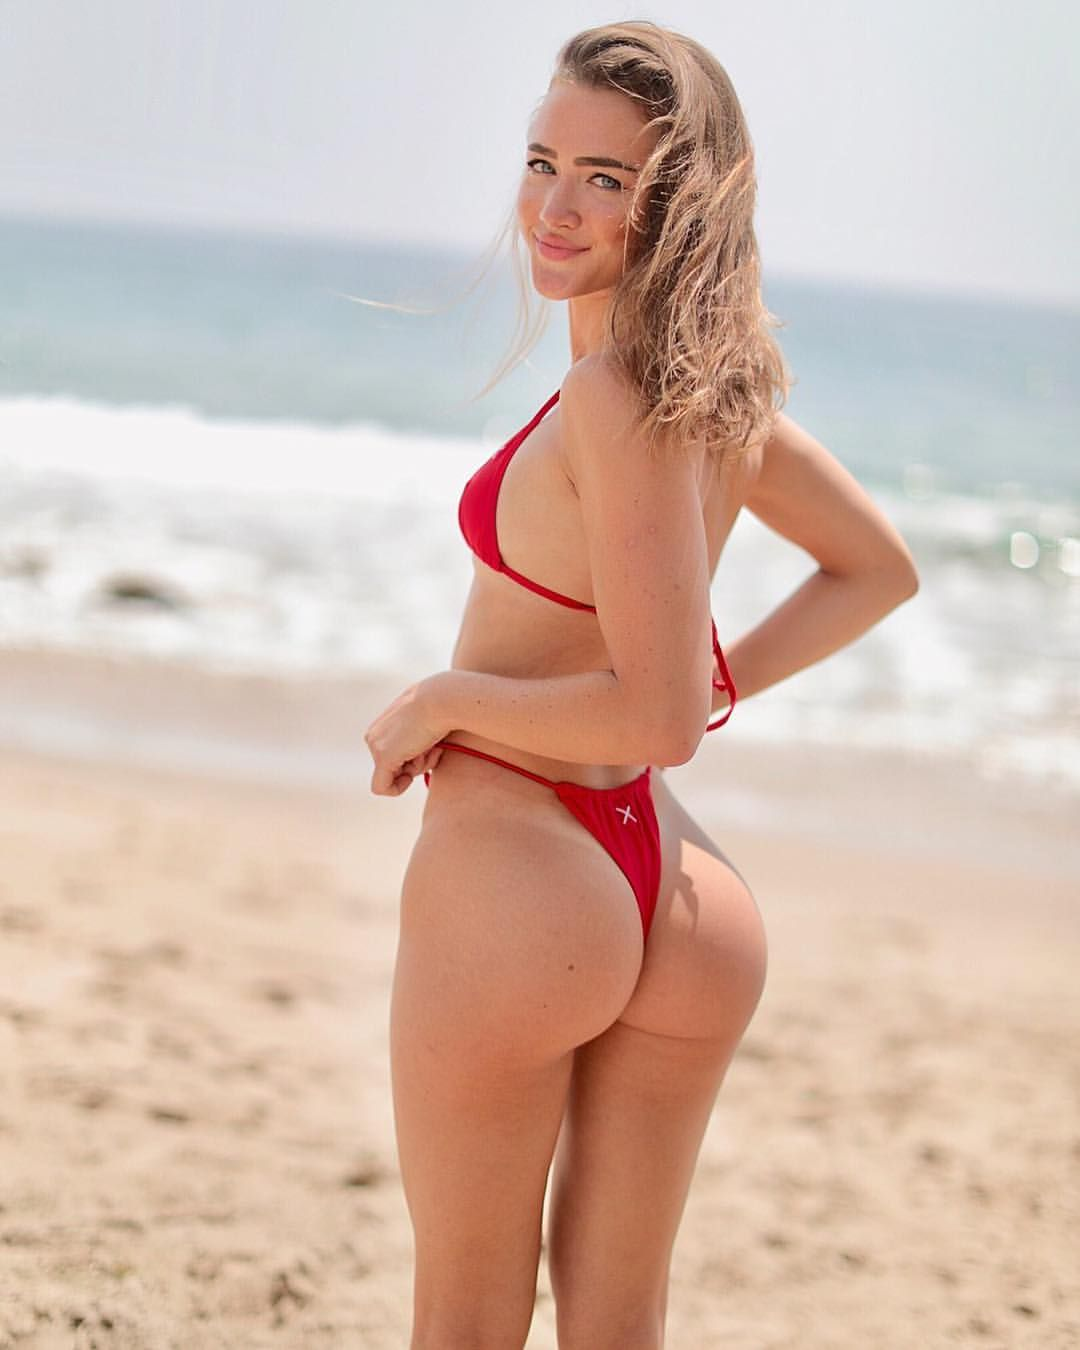 panties Bikini Jessica Rose naked photo 2017